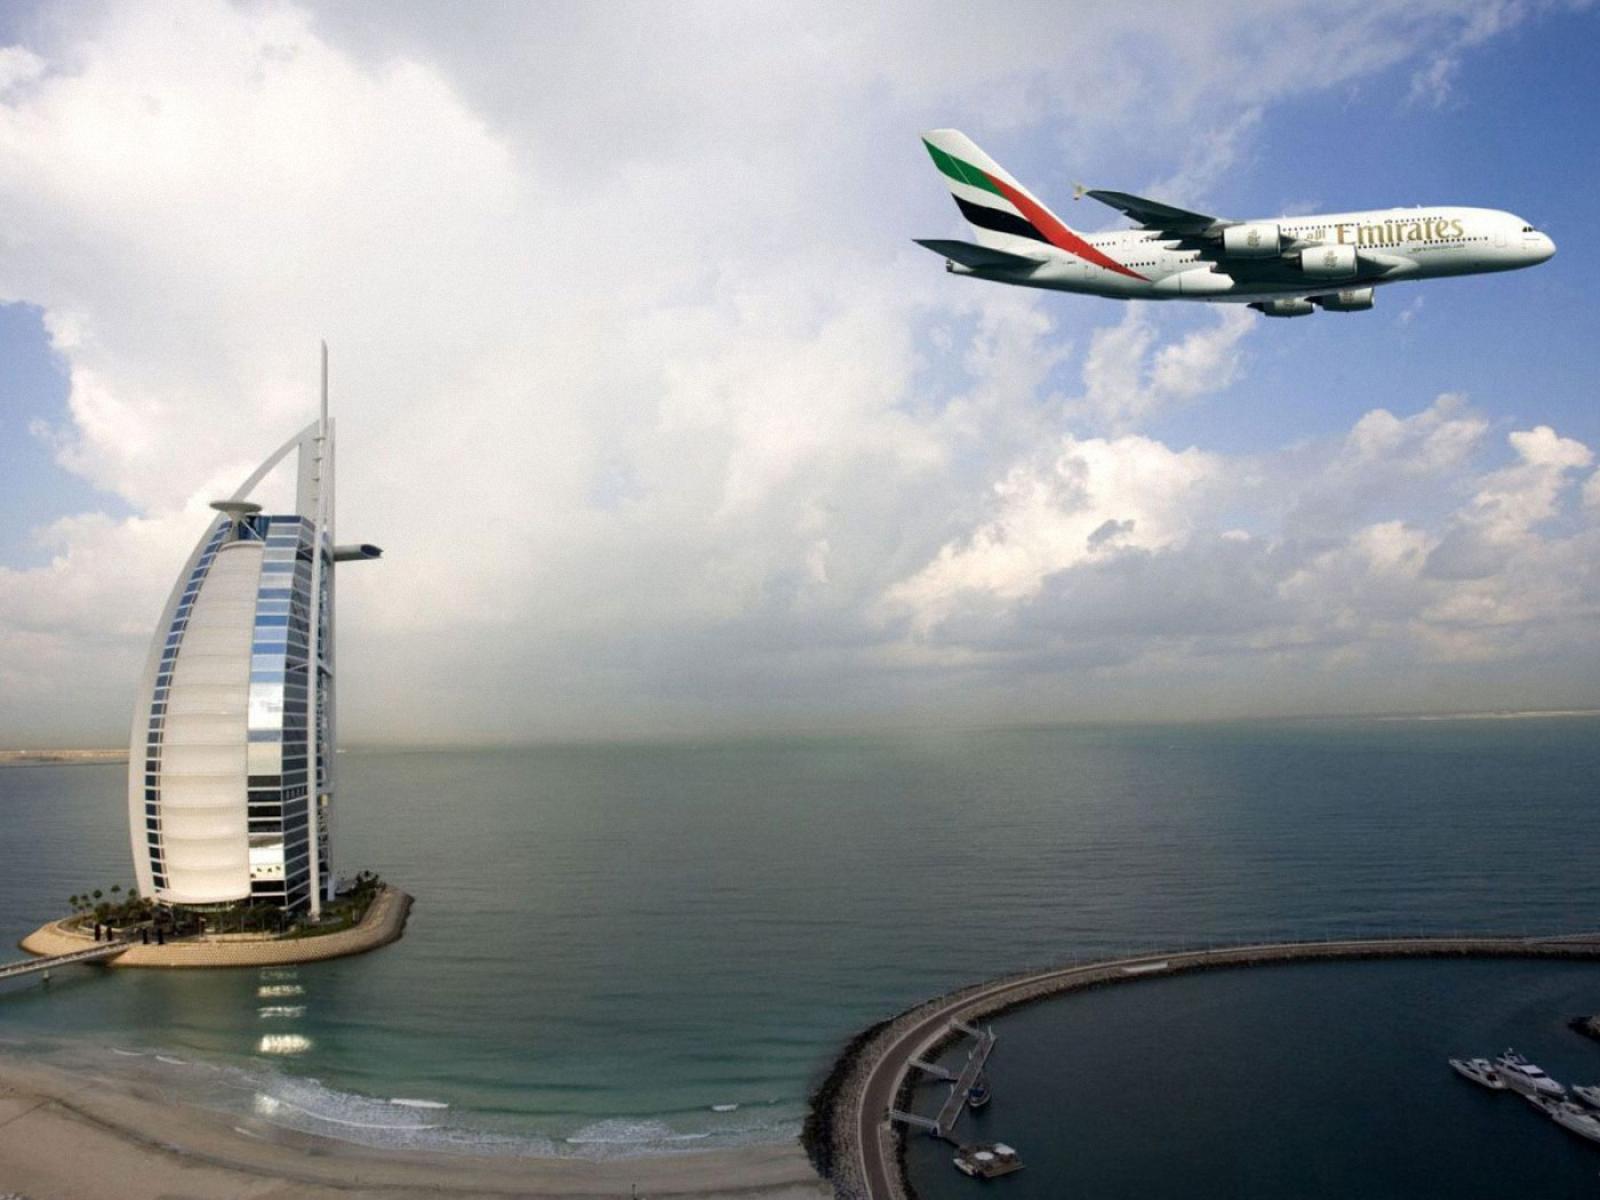 Plane Landing Wallpaper Plane is Landing in Dubai